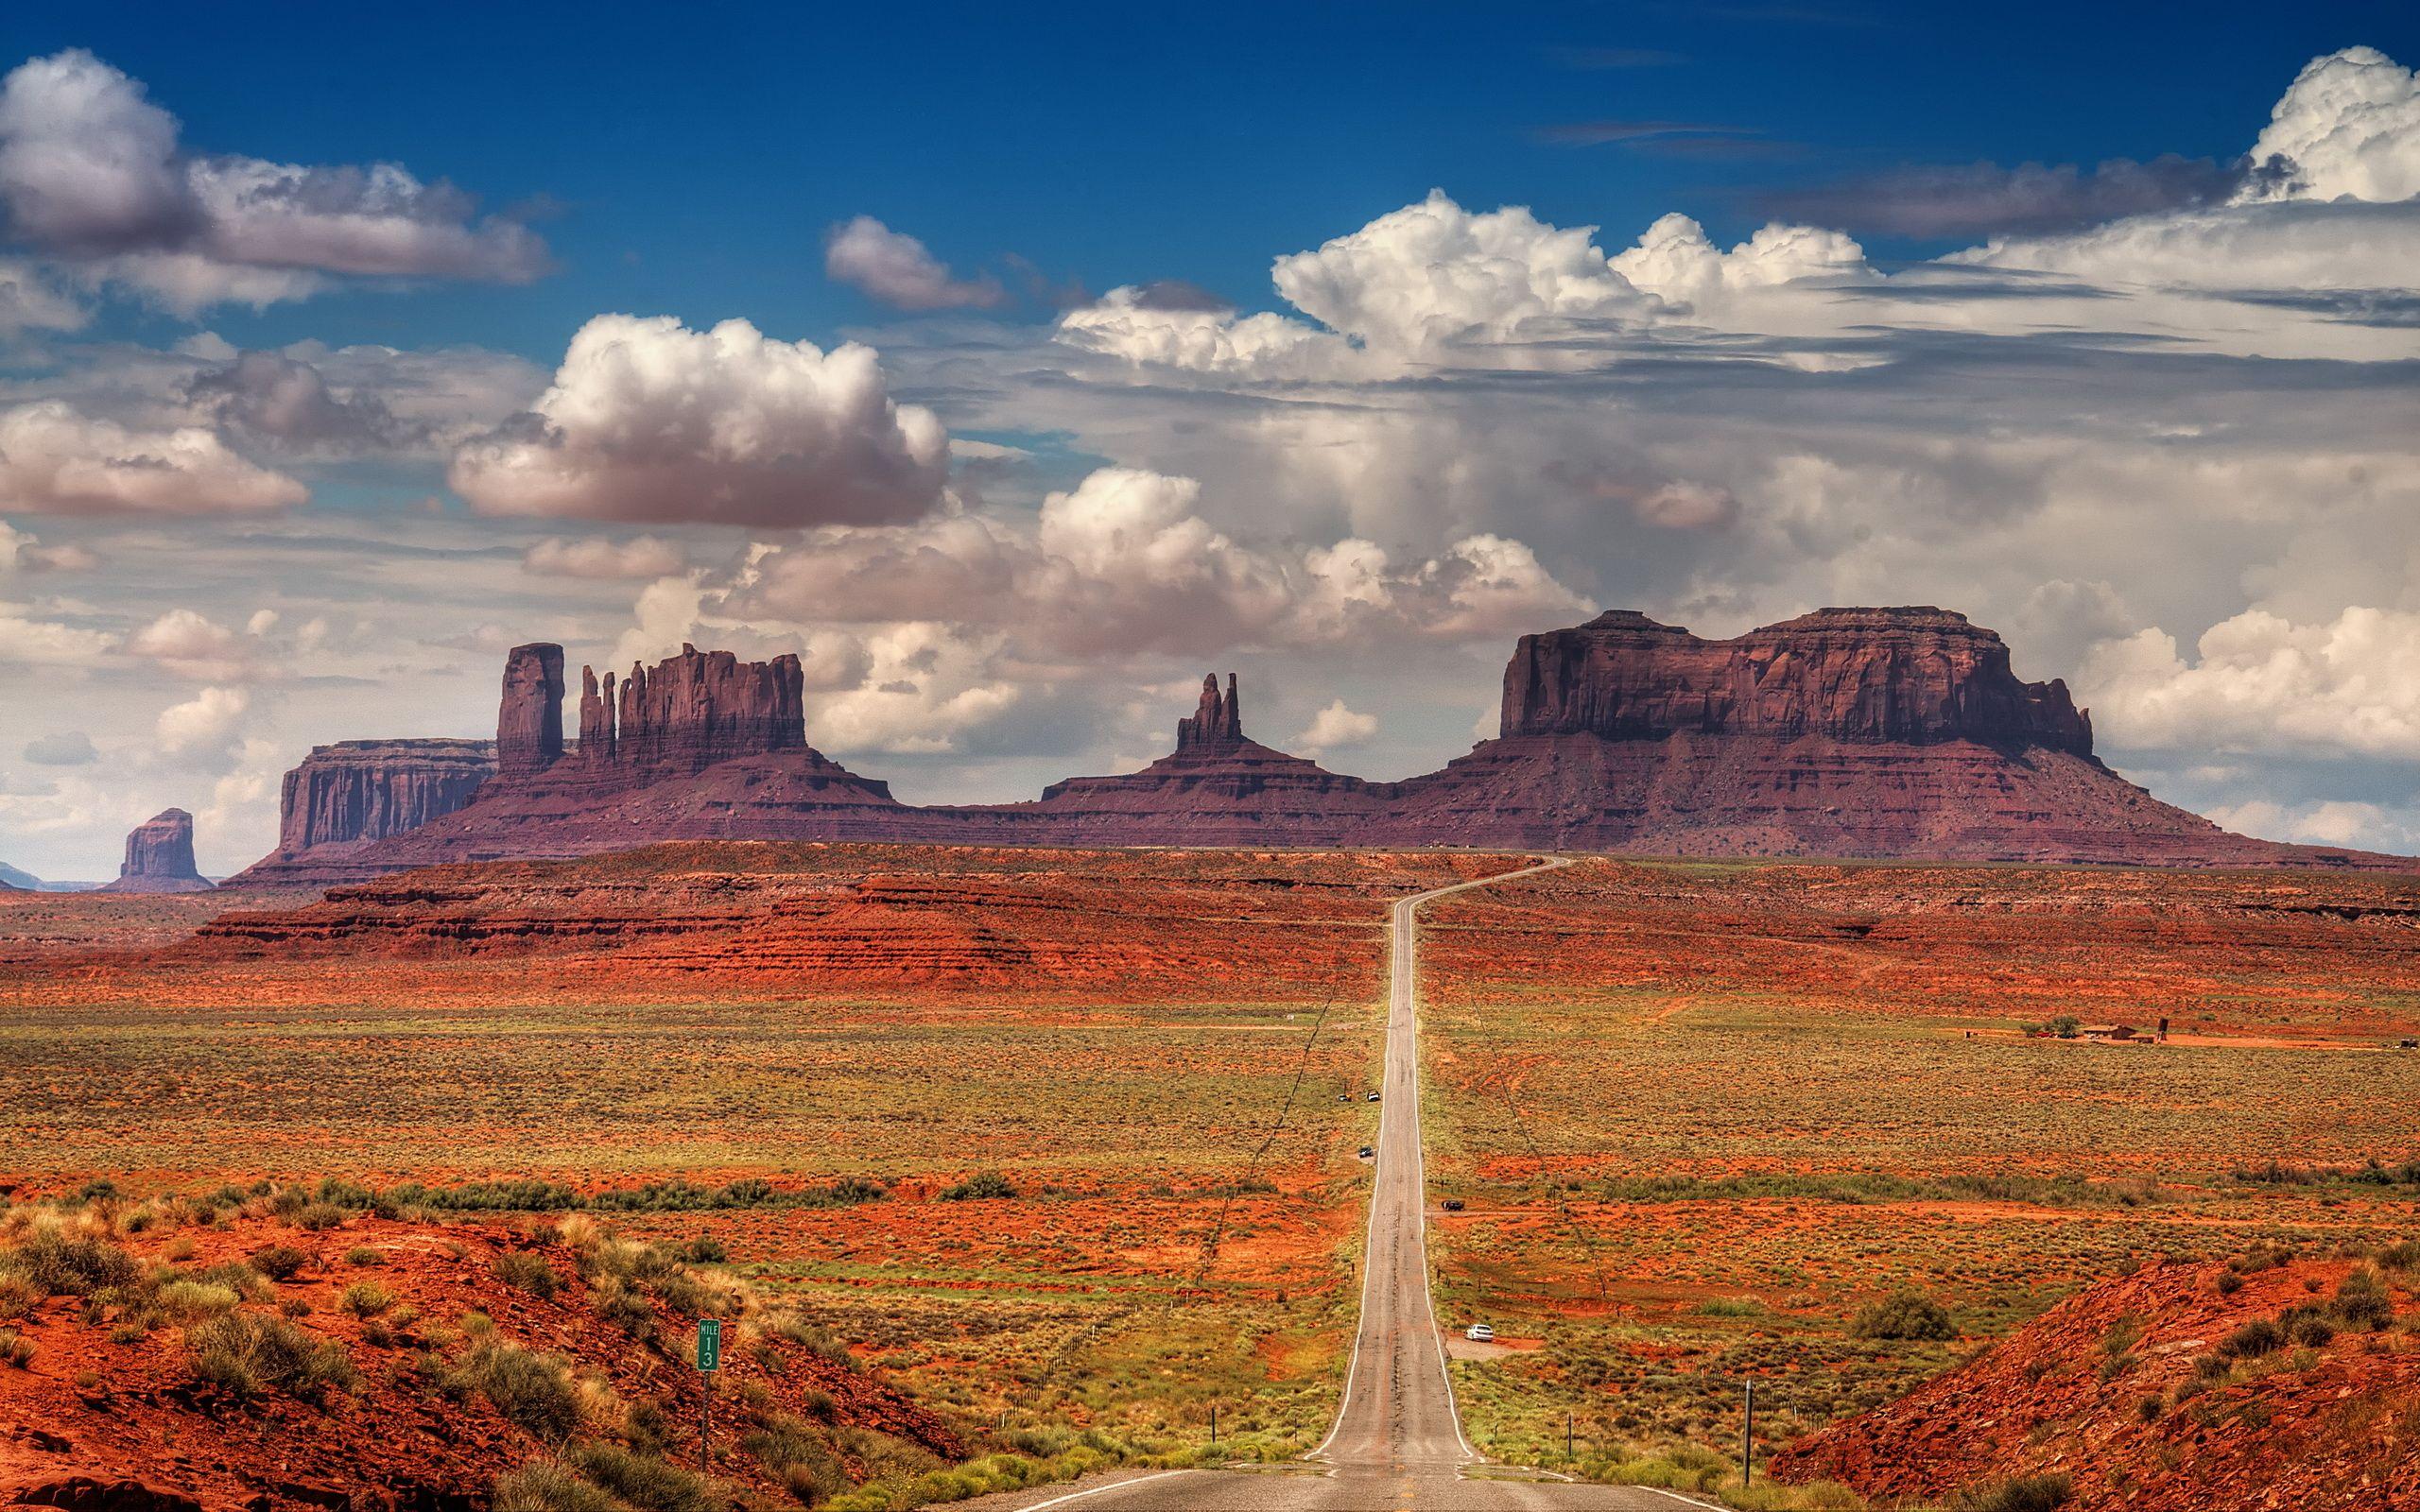 Arizona Desert Wallpaper Hd Monument Valley Monument Valley